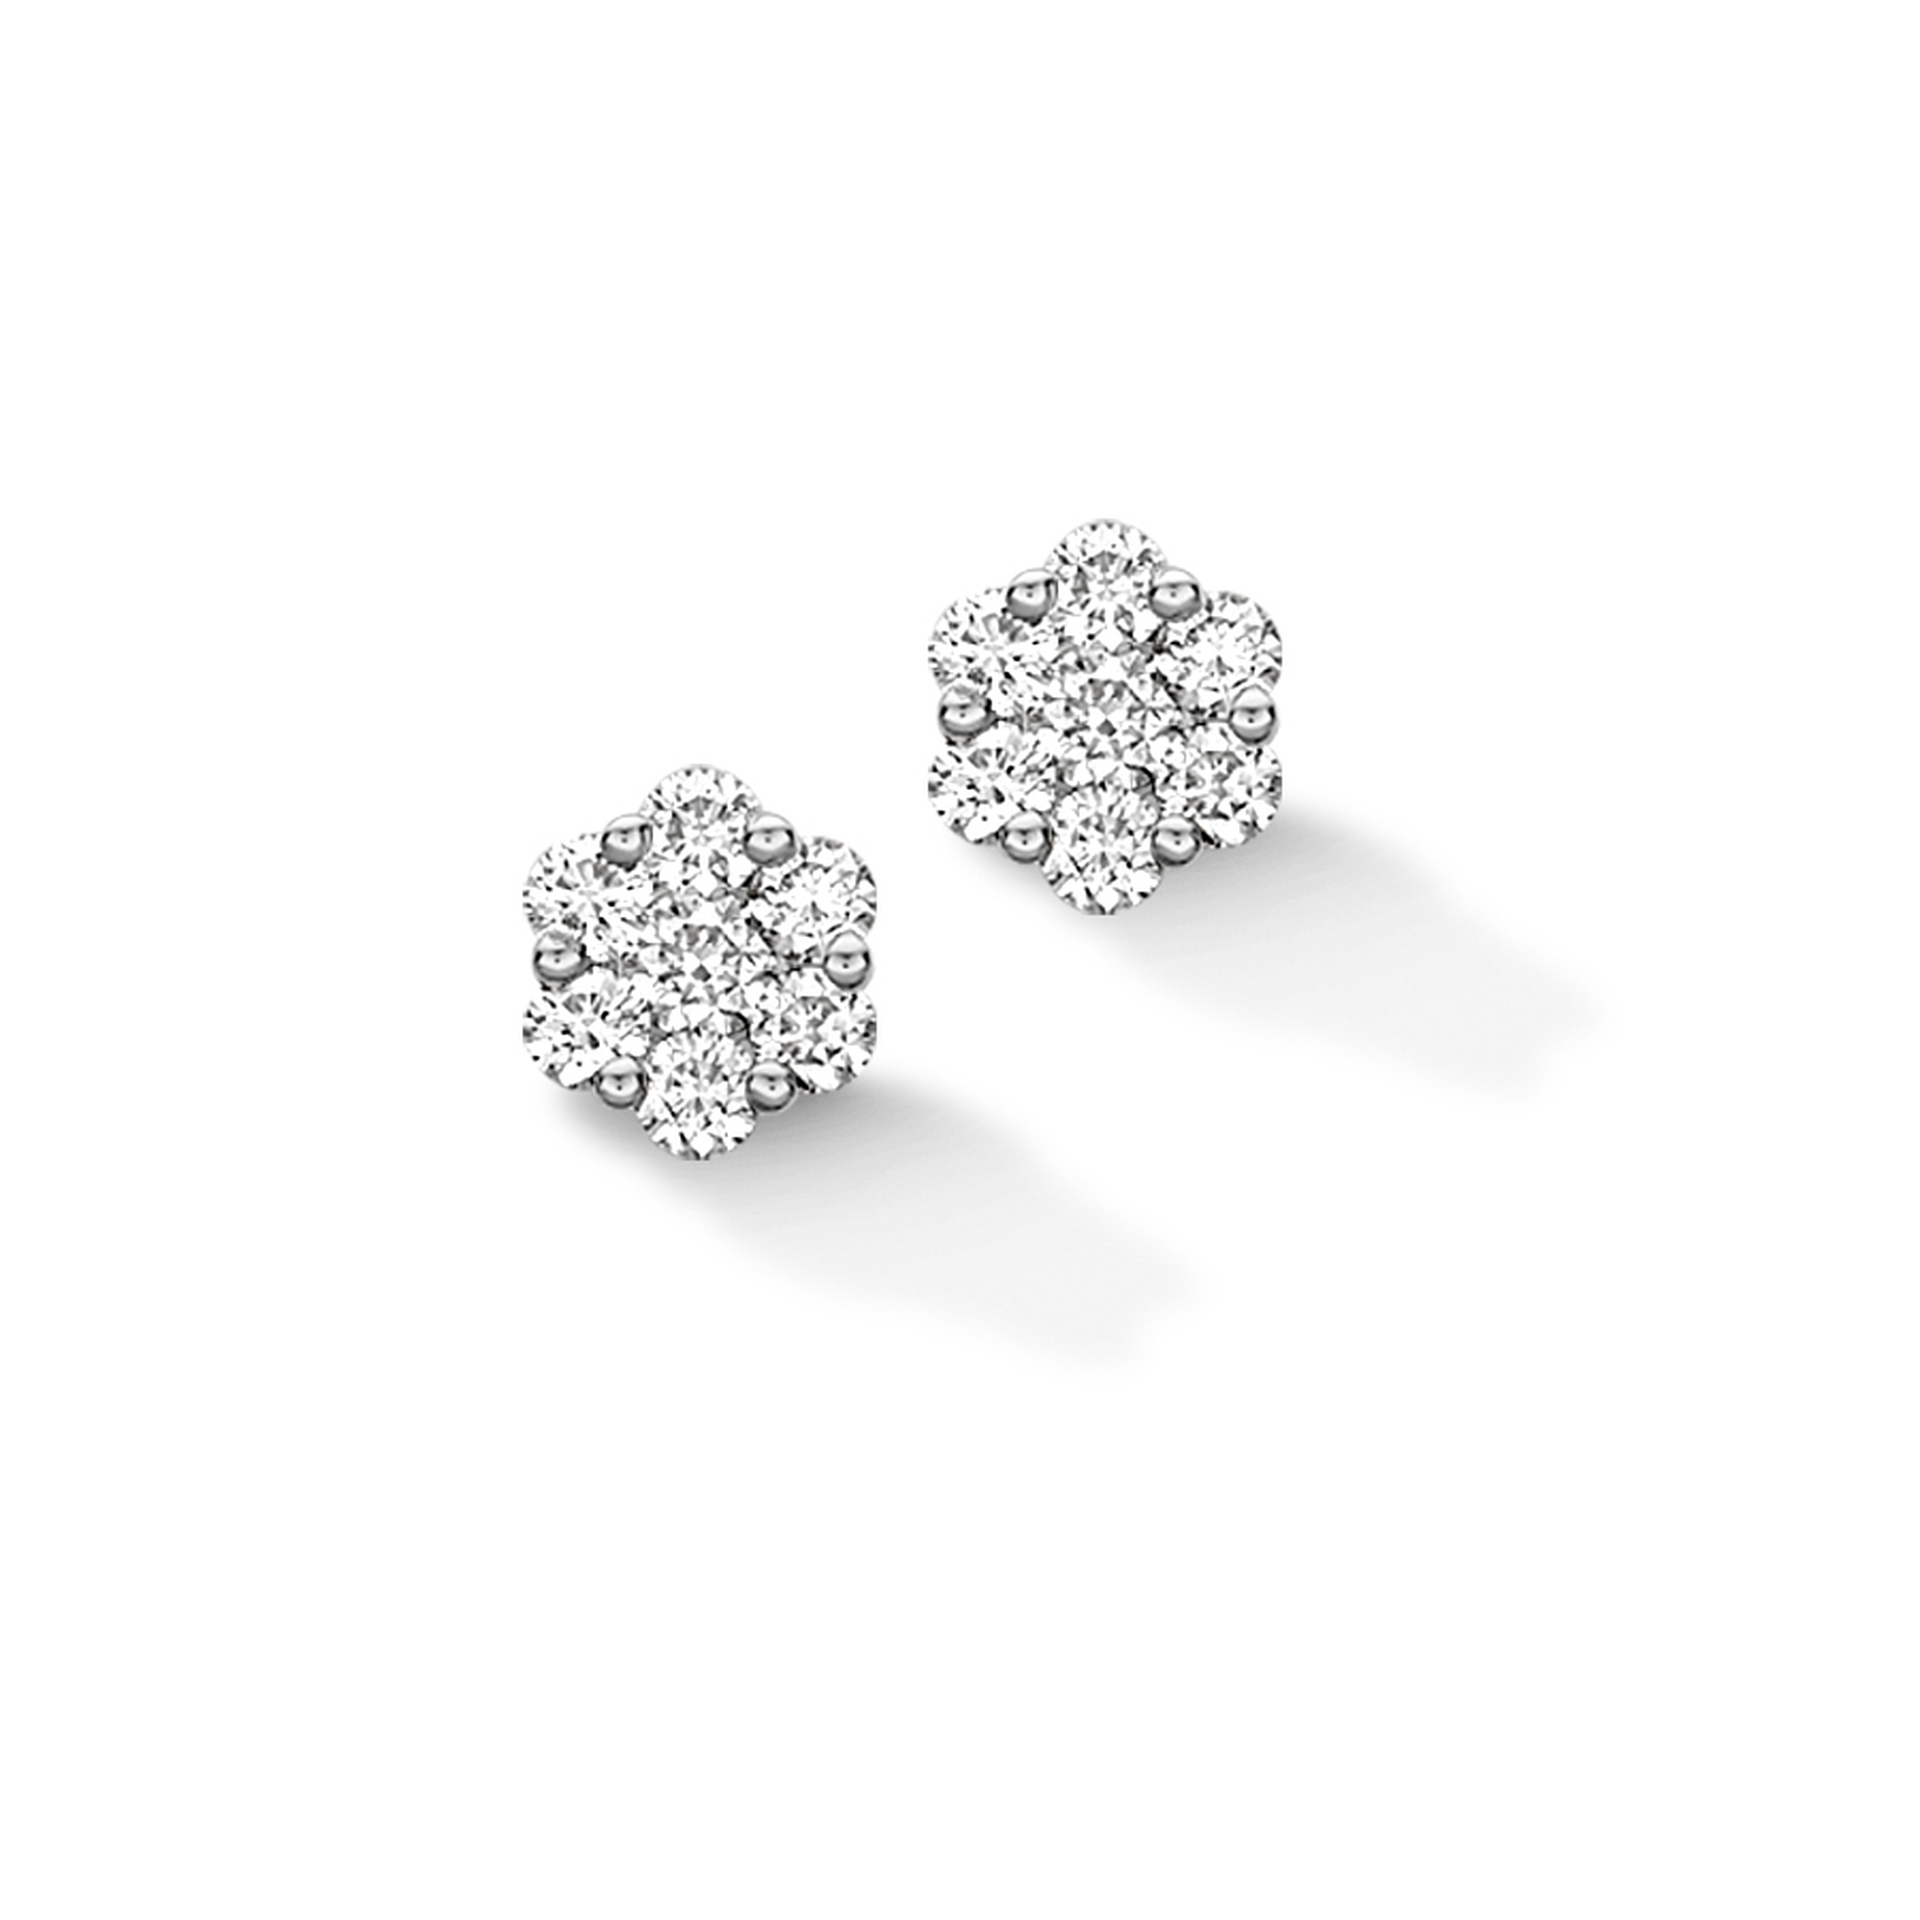 Rudells Daisy 18ct White Gold Diamond Earrings 1.00ct